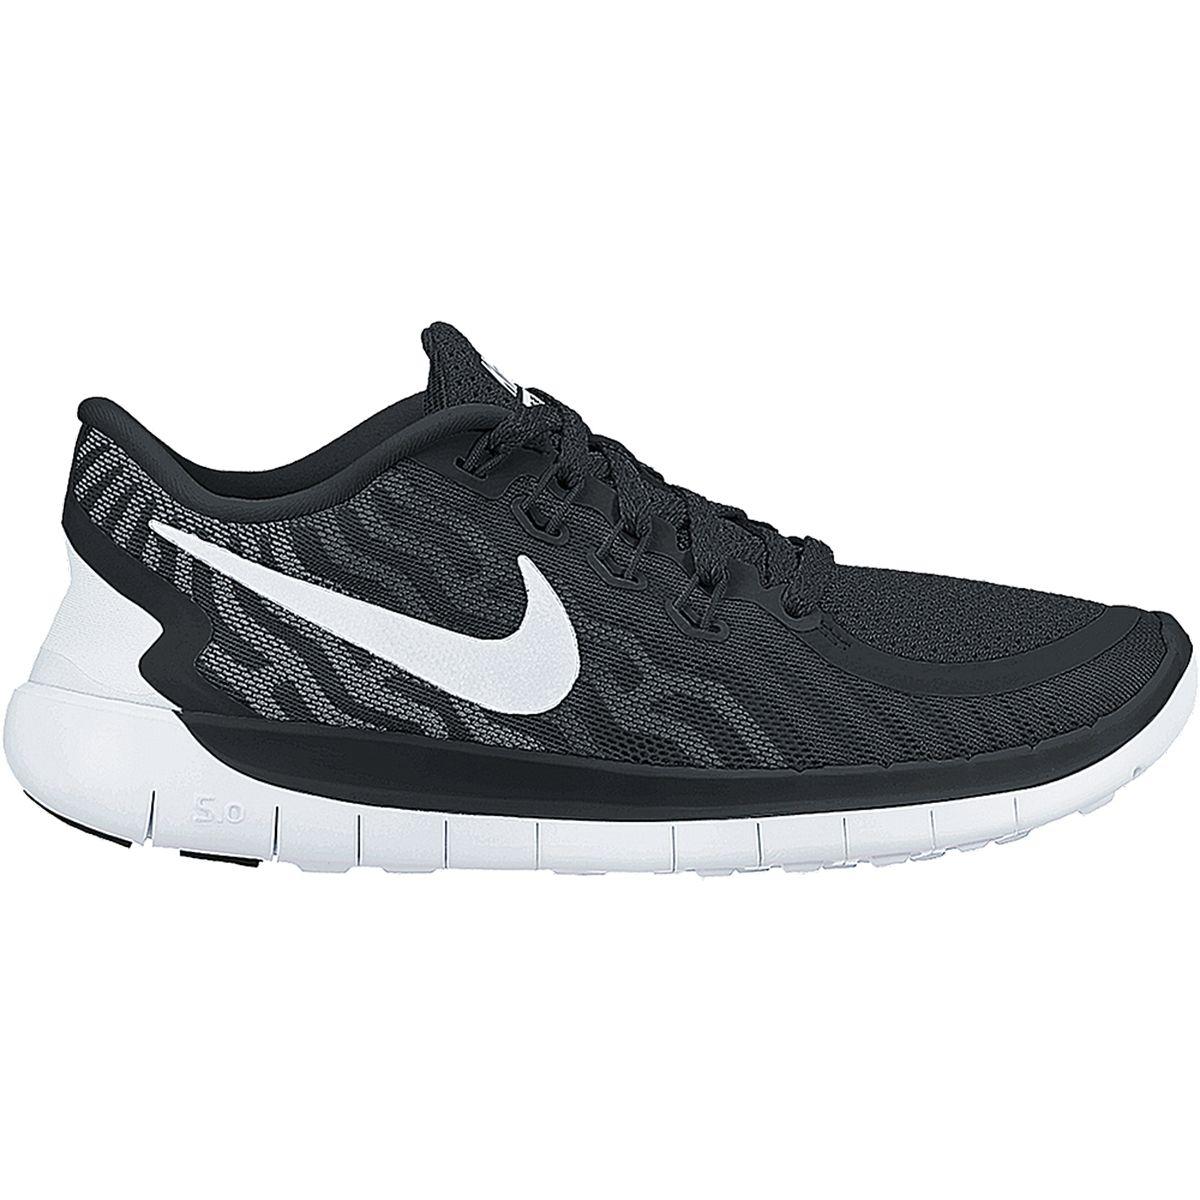 online store ea2ee 1d612 Tênis Nike Free 5.0 Masculino - Preto e Branco | Fitness | Sneakers ...